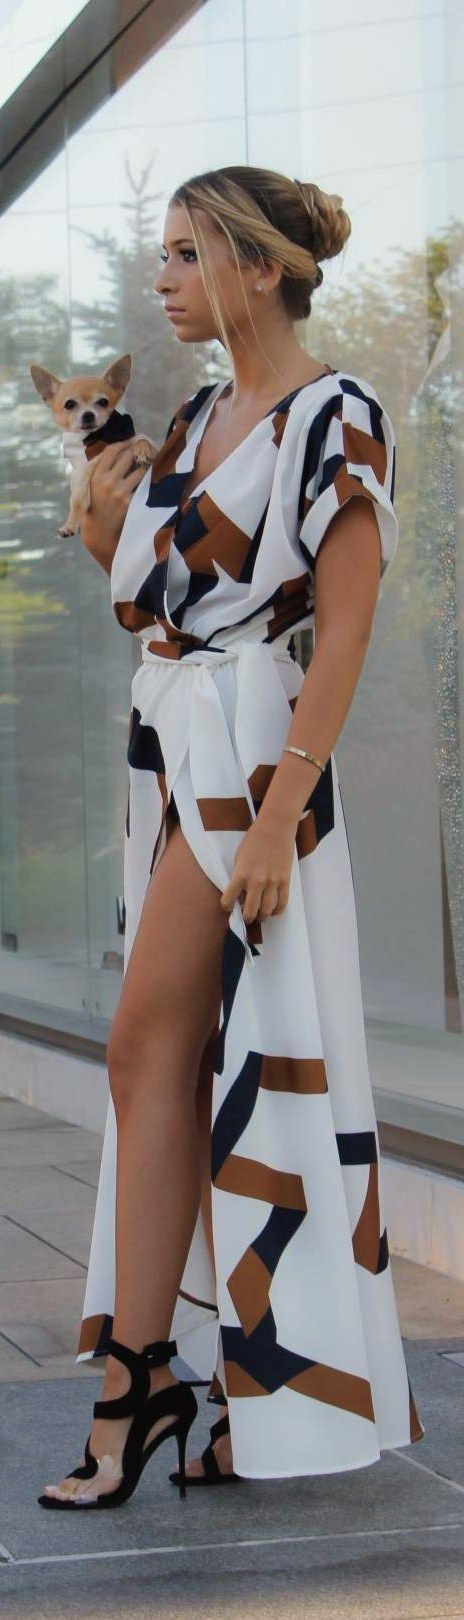 Maxi Love // Dress: Shop Glamour Girl | Shoes: Giuseppe Zanotti (Steven Dann) // Fashion Trend by Style With Trix